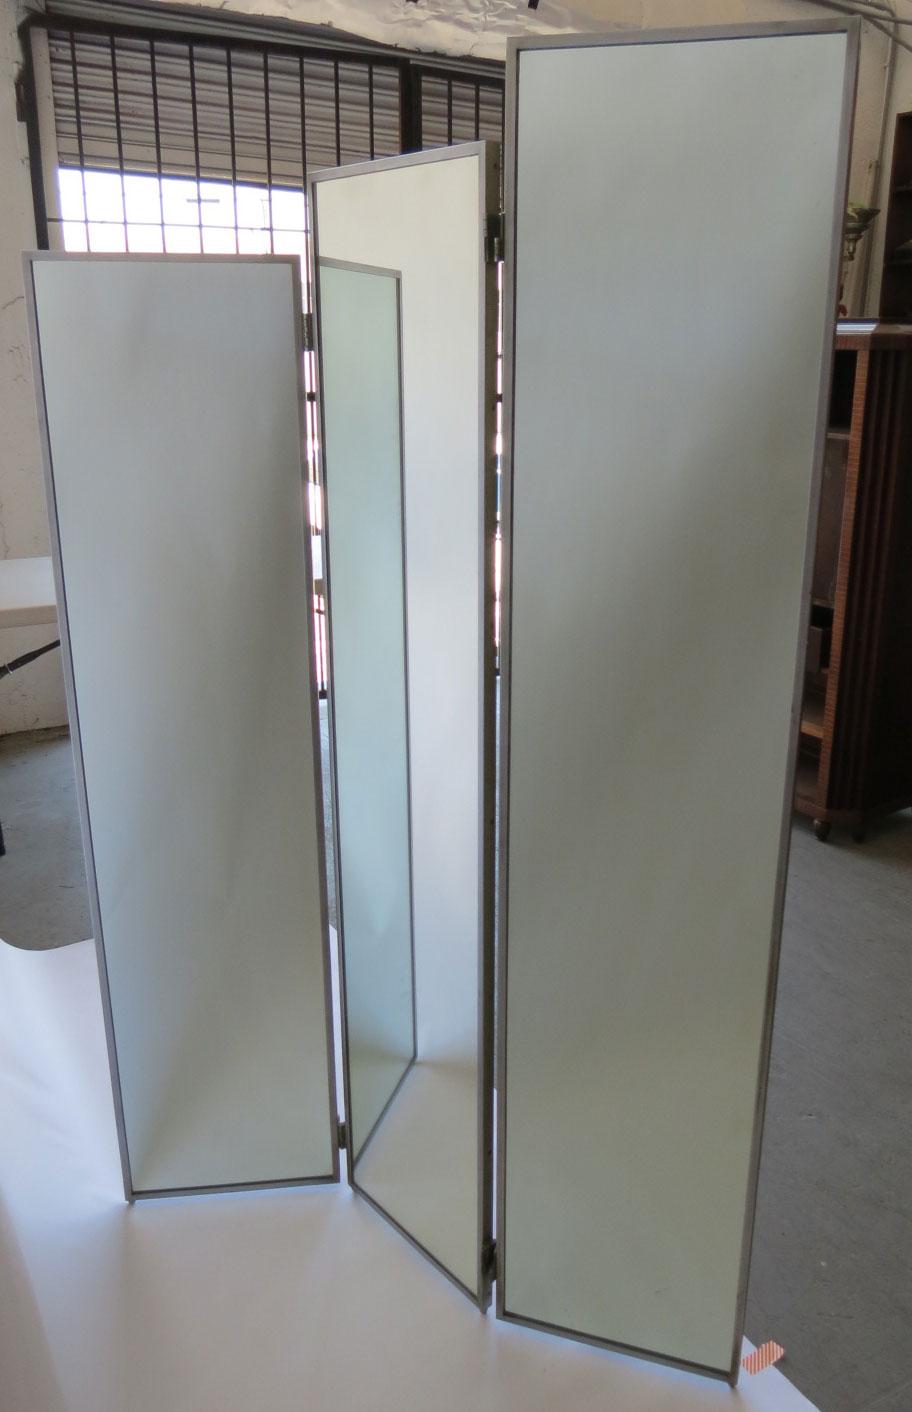 American art deco mirror skyscraper folding screen modernism for Mirror screen